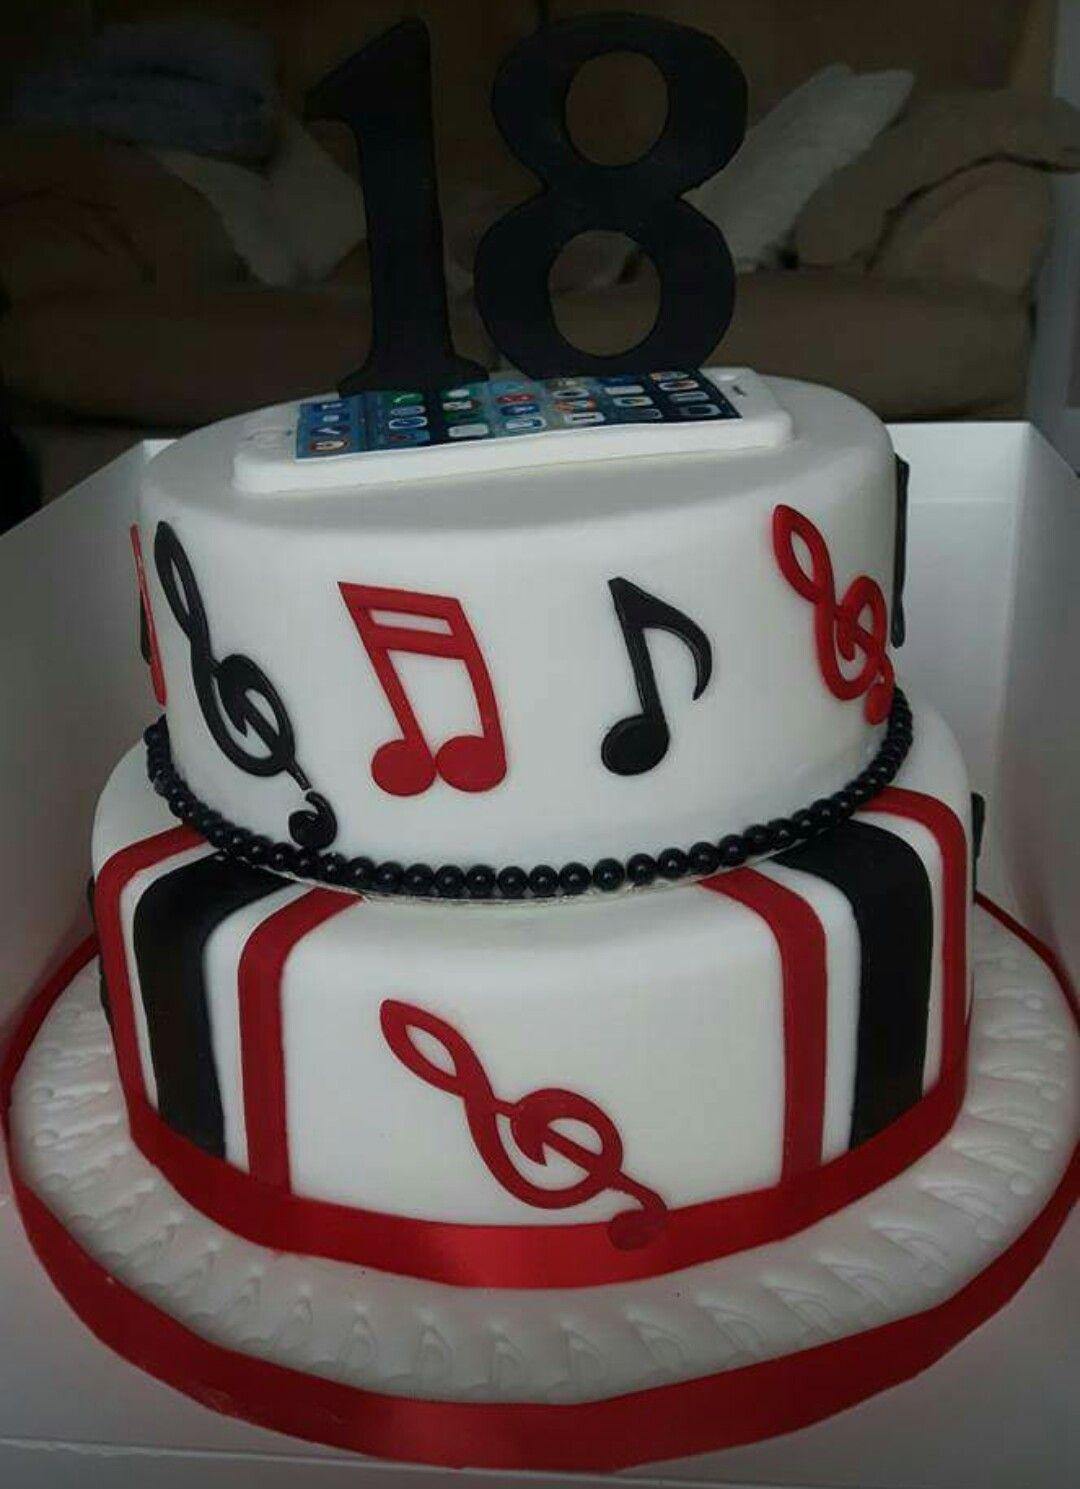 Iphone Birthday Cake Birthday Cakes Pinterest Birthday Cakes